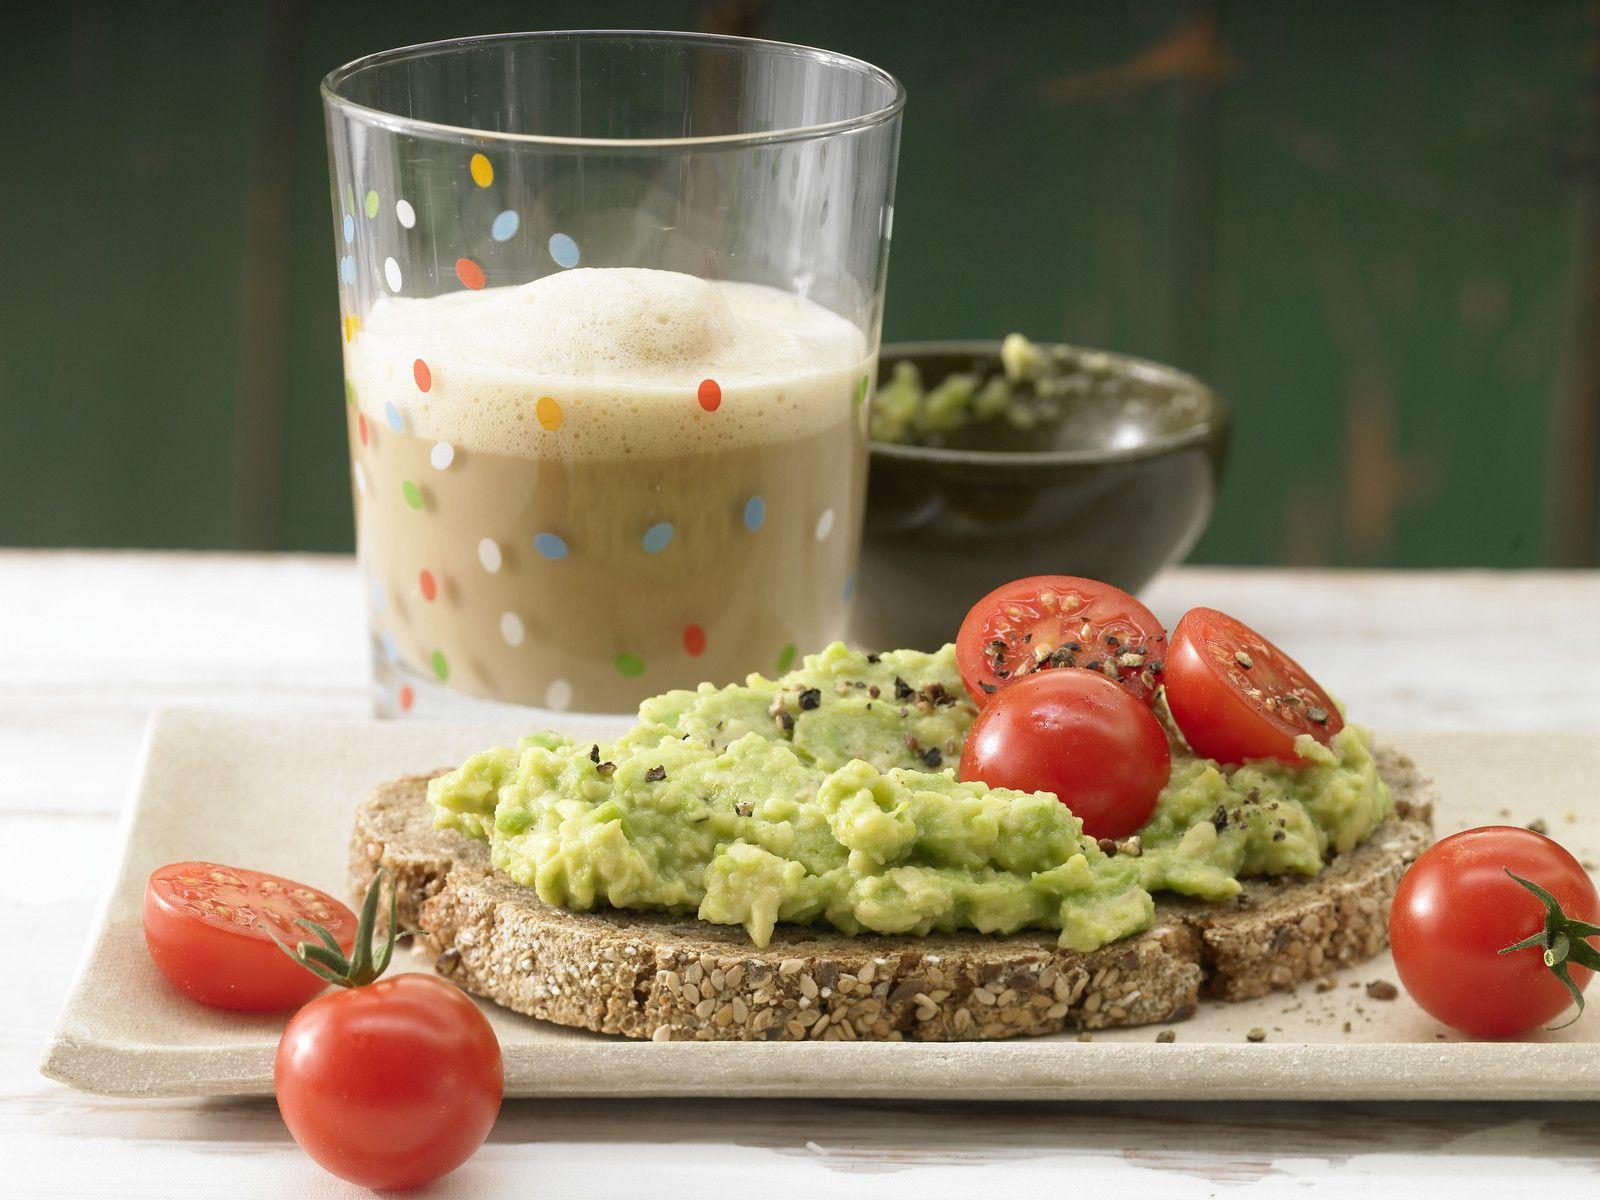 Avocadocreme Auf Vollkornbrot Rezept Eat Smarter